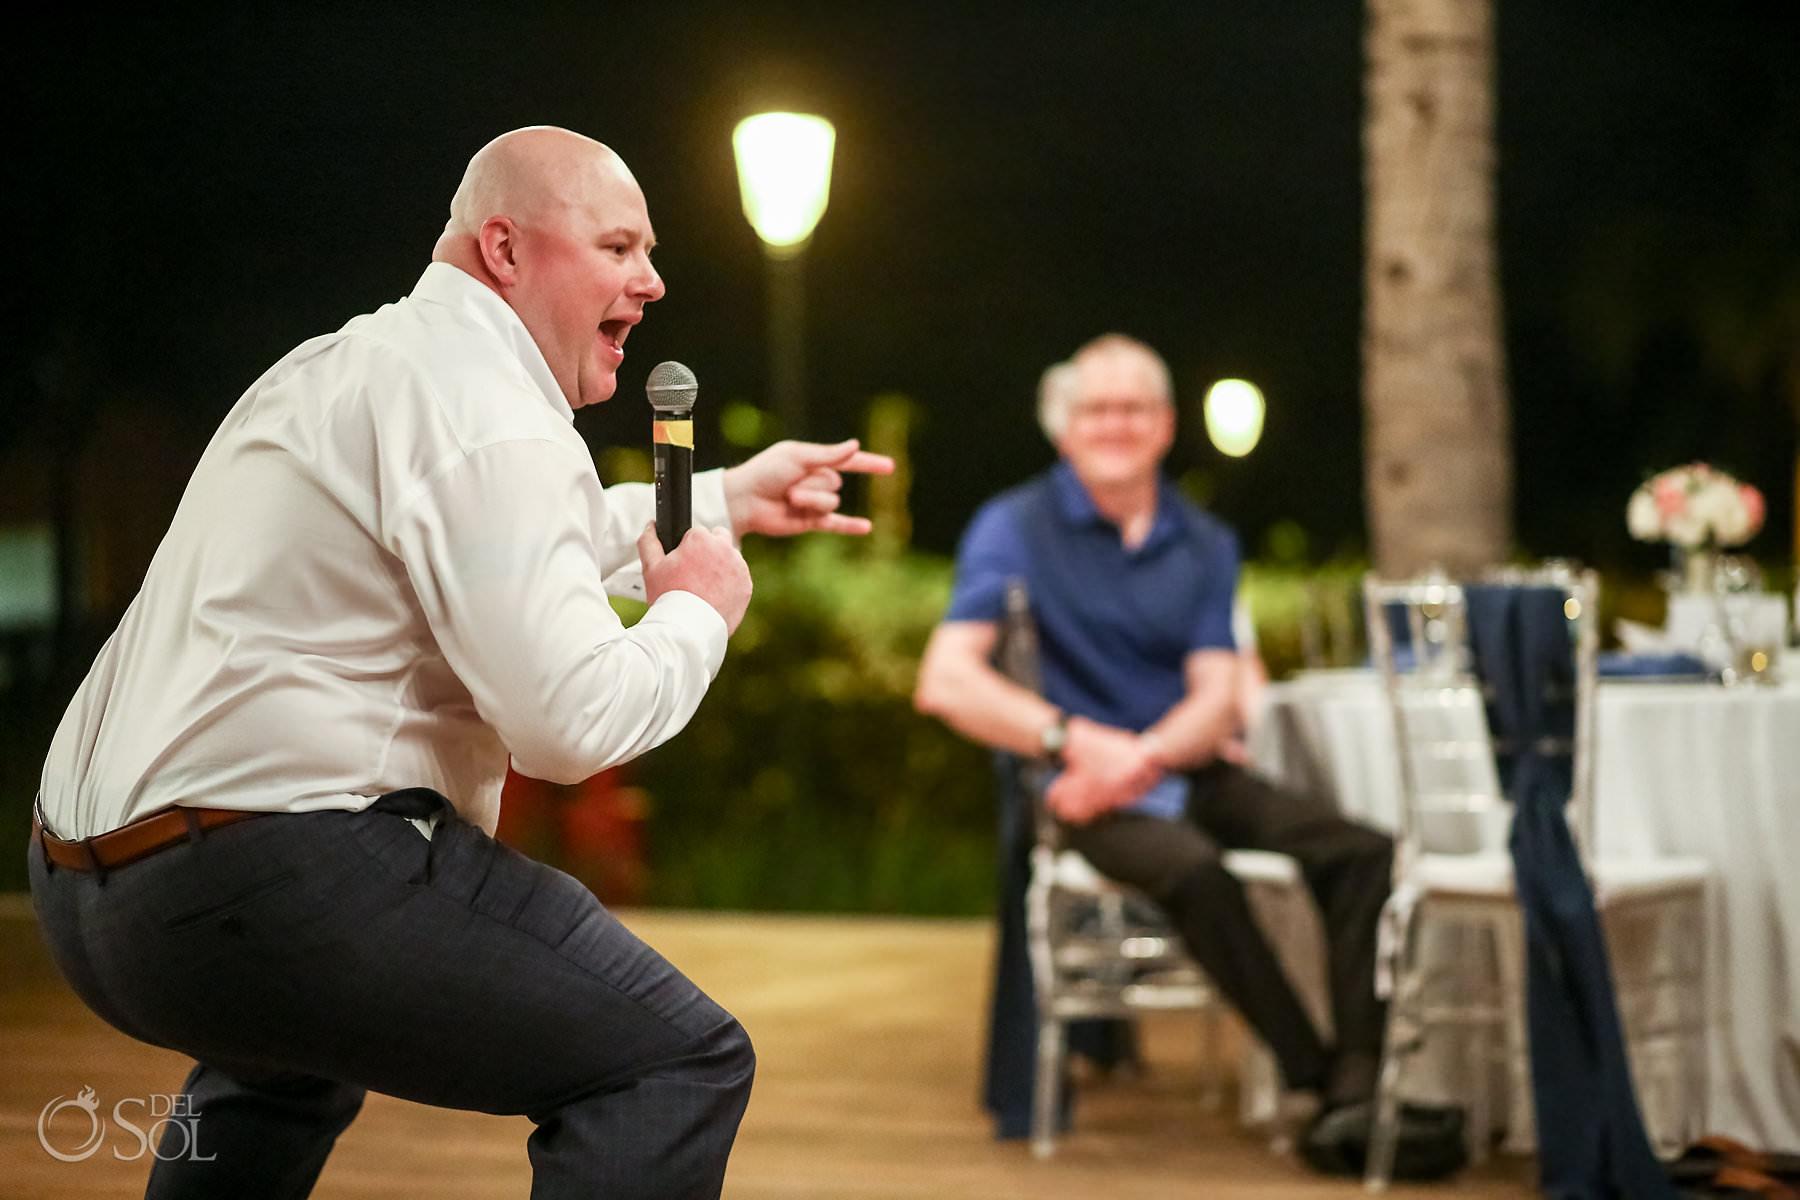 best man fun speech Captain Morgan Grill wedding reception